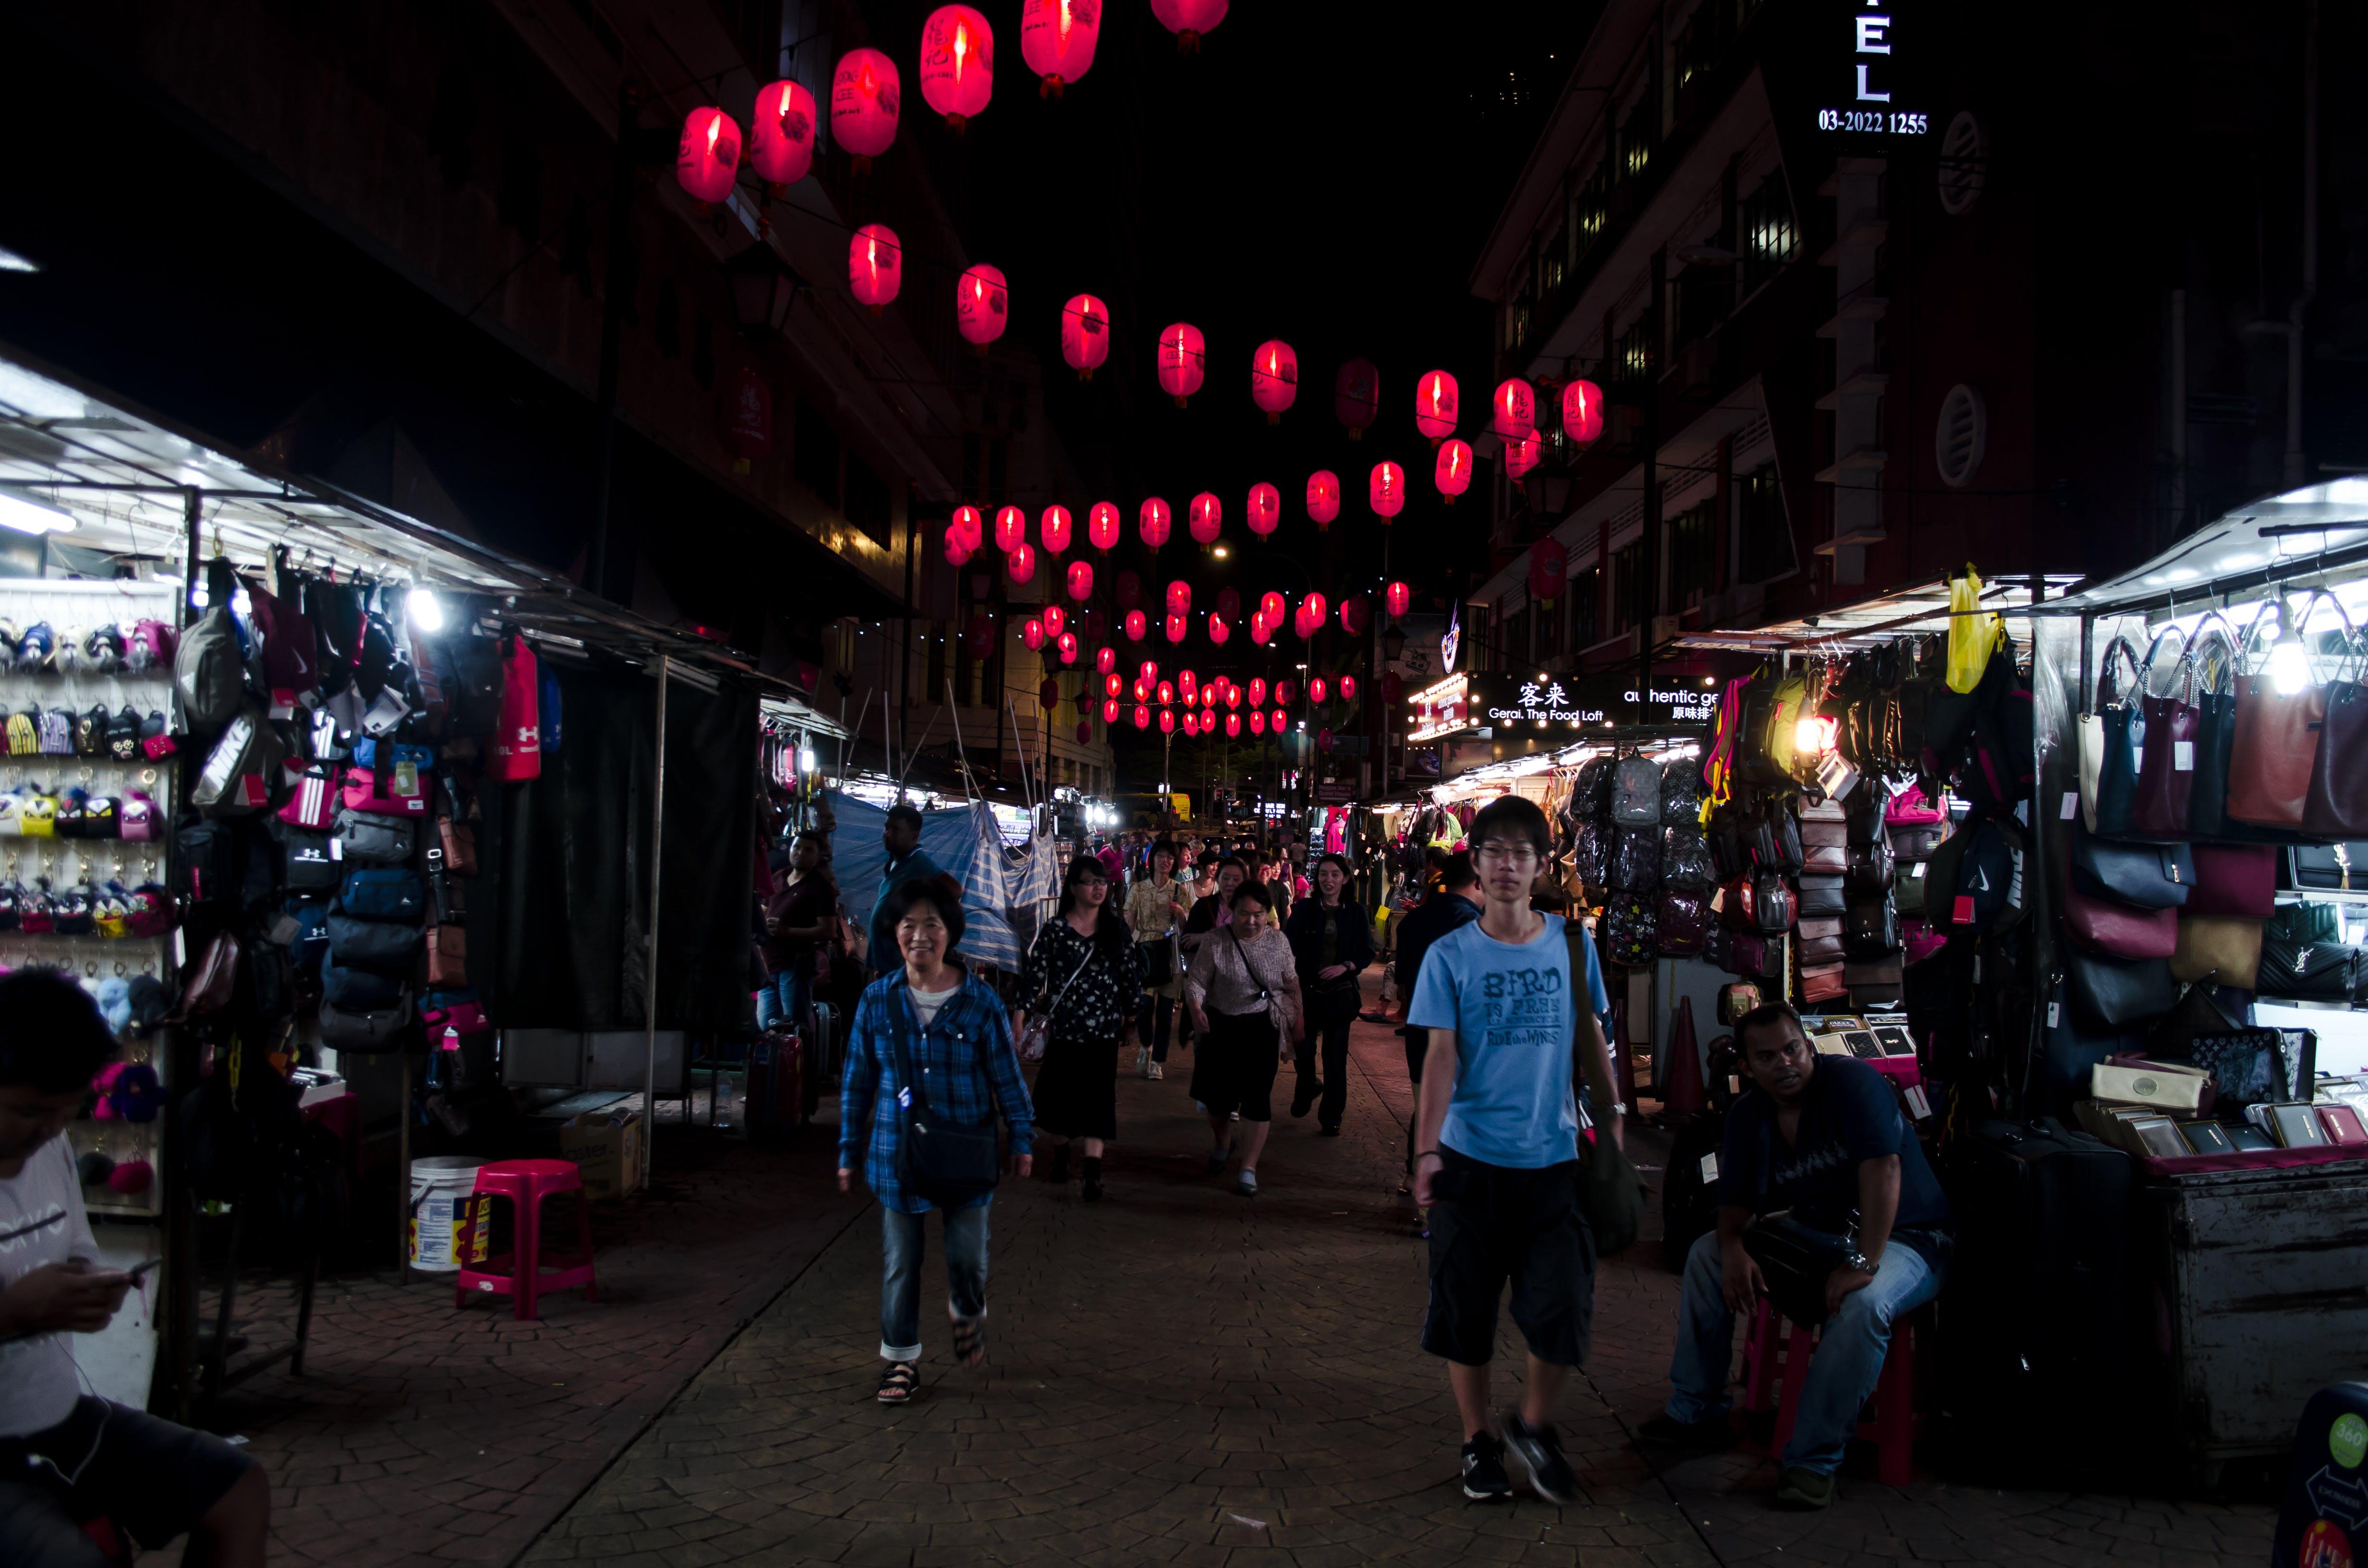 Man Wearing Blue T-shirt Near Clothes Lot